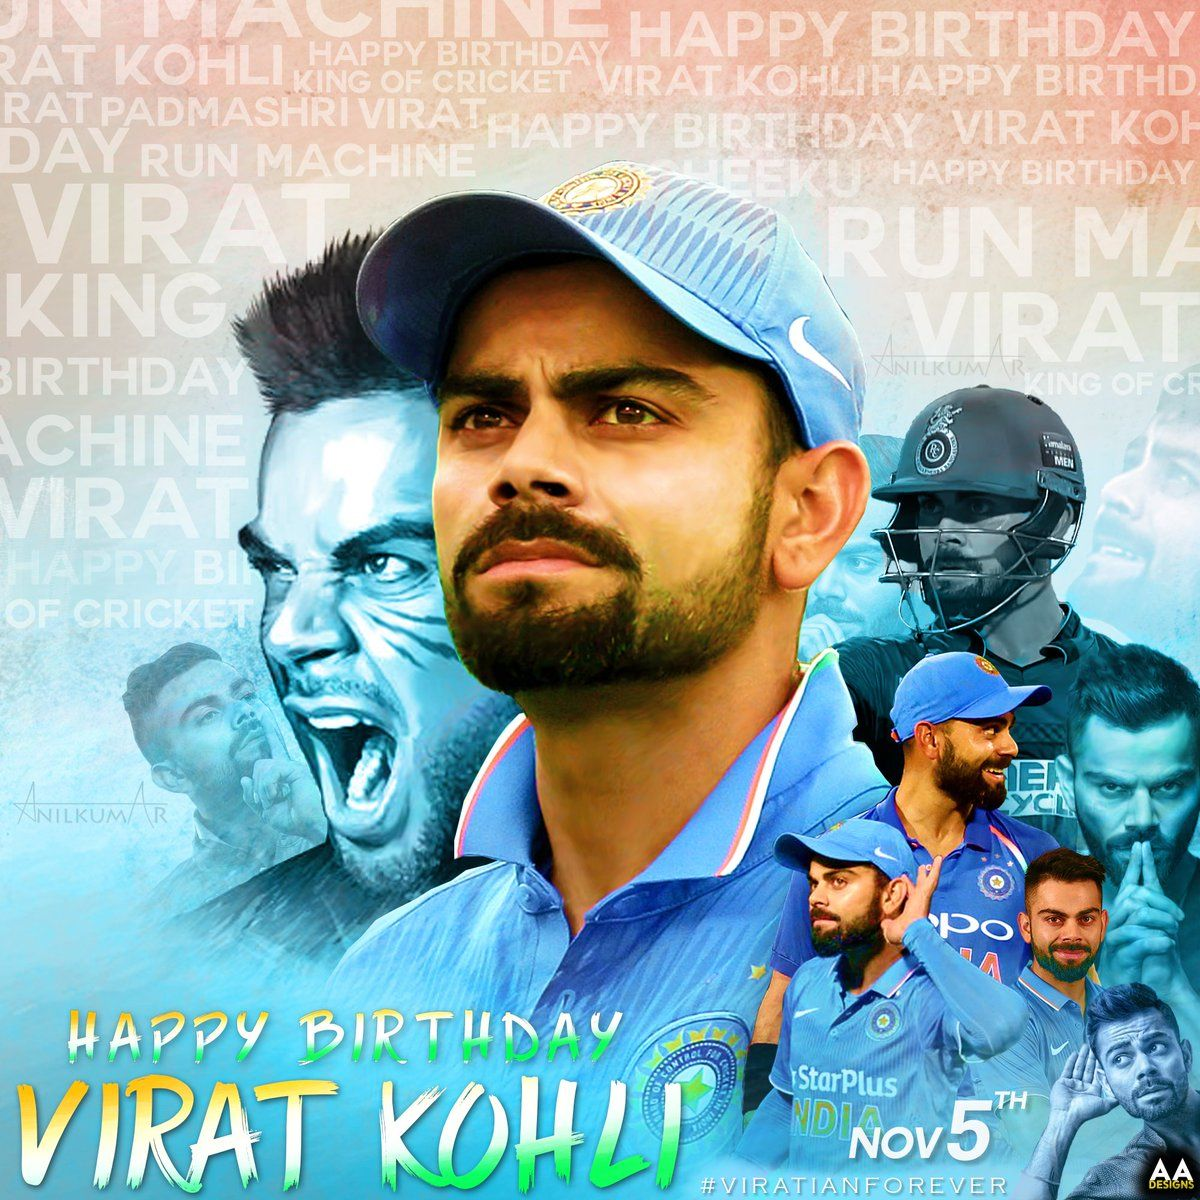 ViratKohli Cricket HBDVirat विराटकोहली Virat Kohli